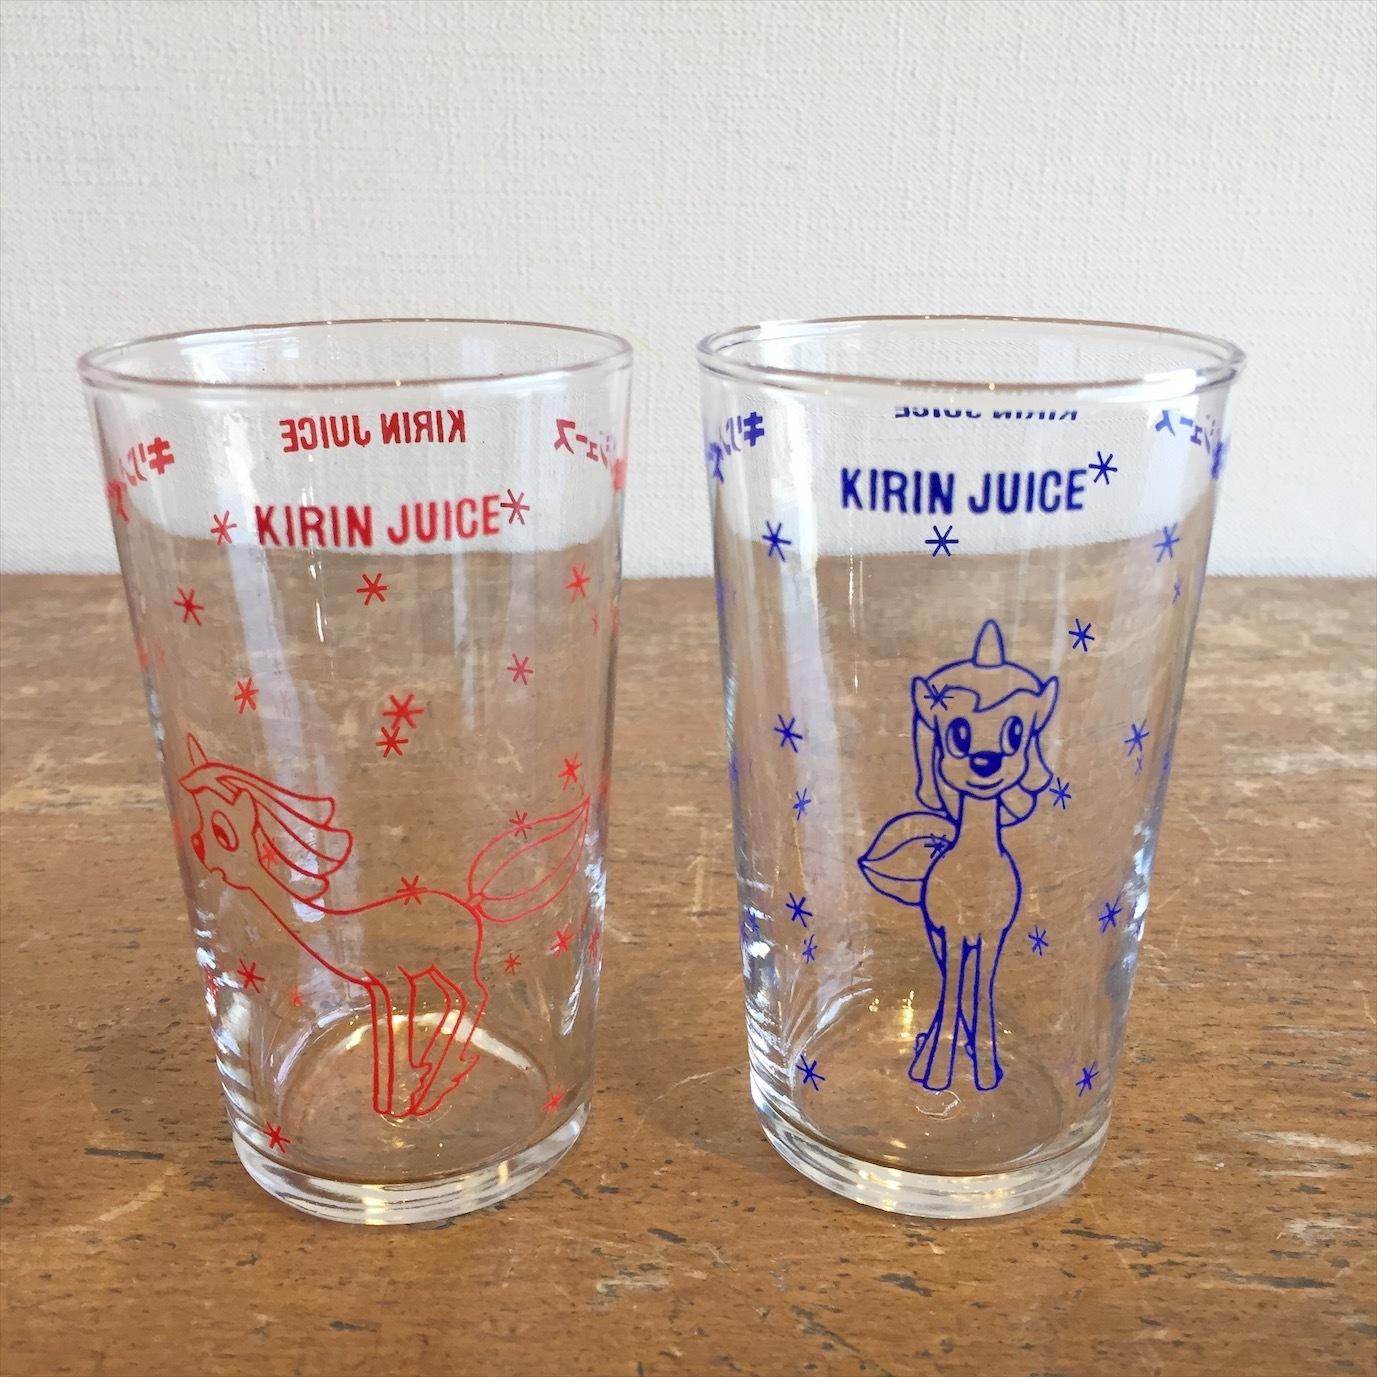 KIRIN JUICEノベルティグラス